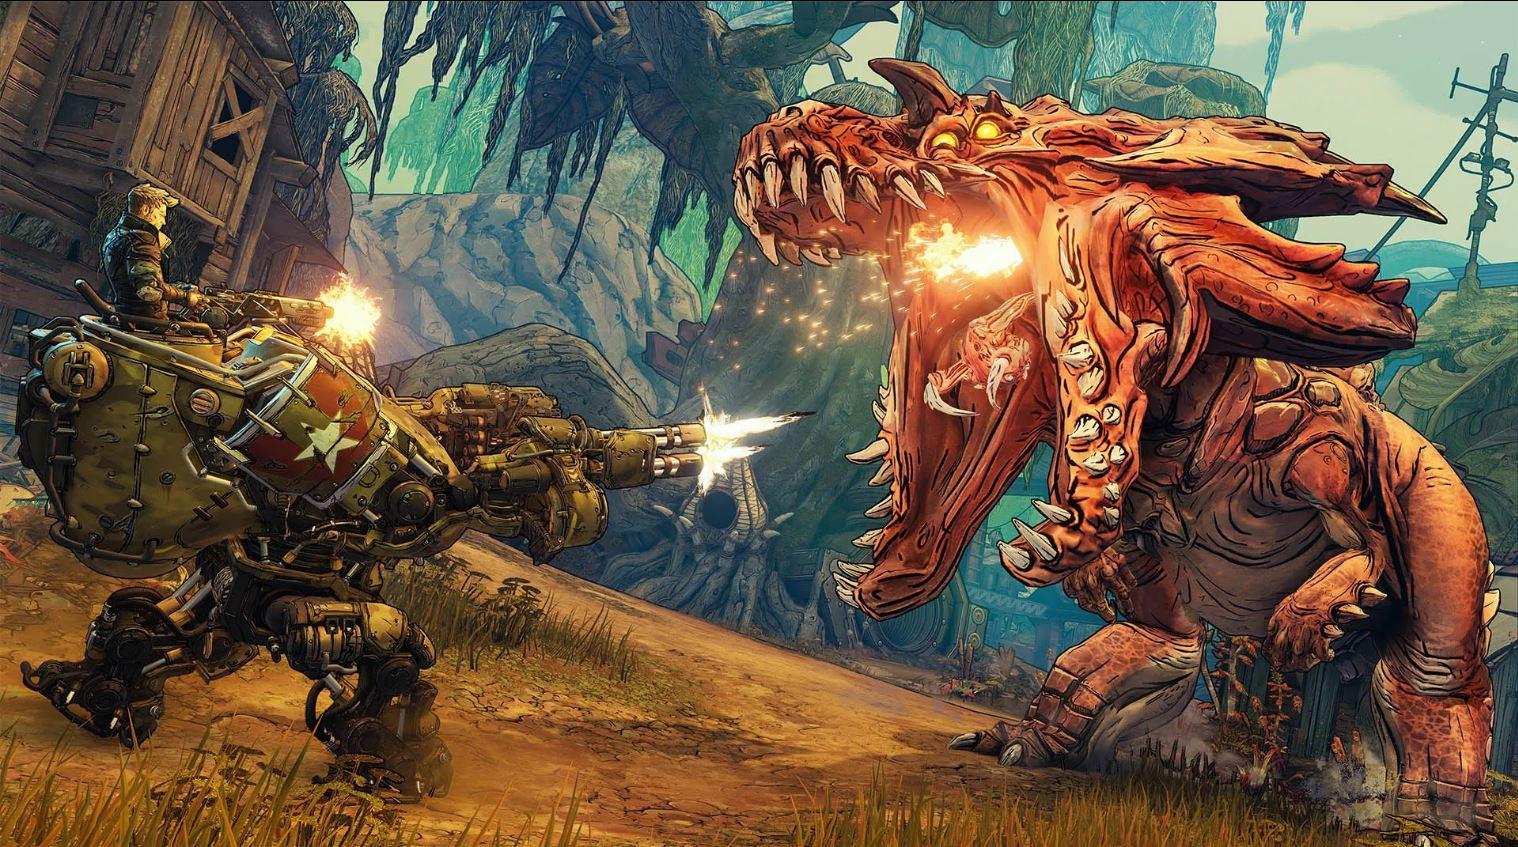 Image for Borderlands 3 is 2K's fastest ever selling game